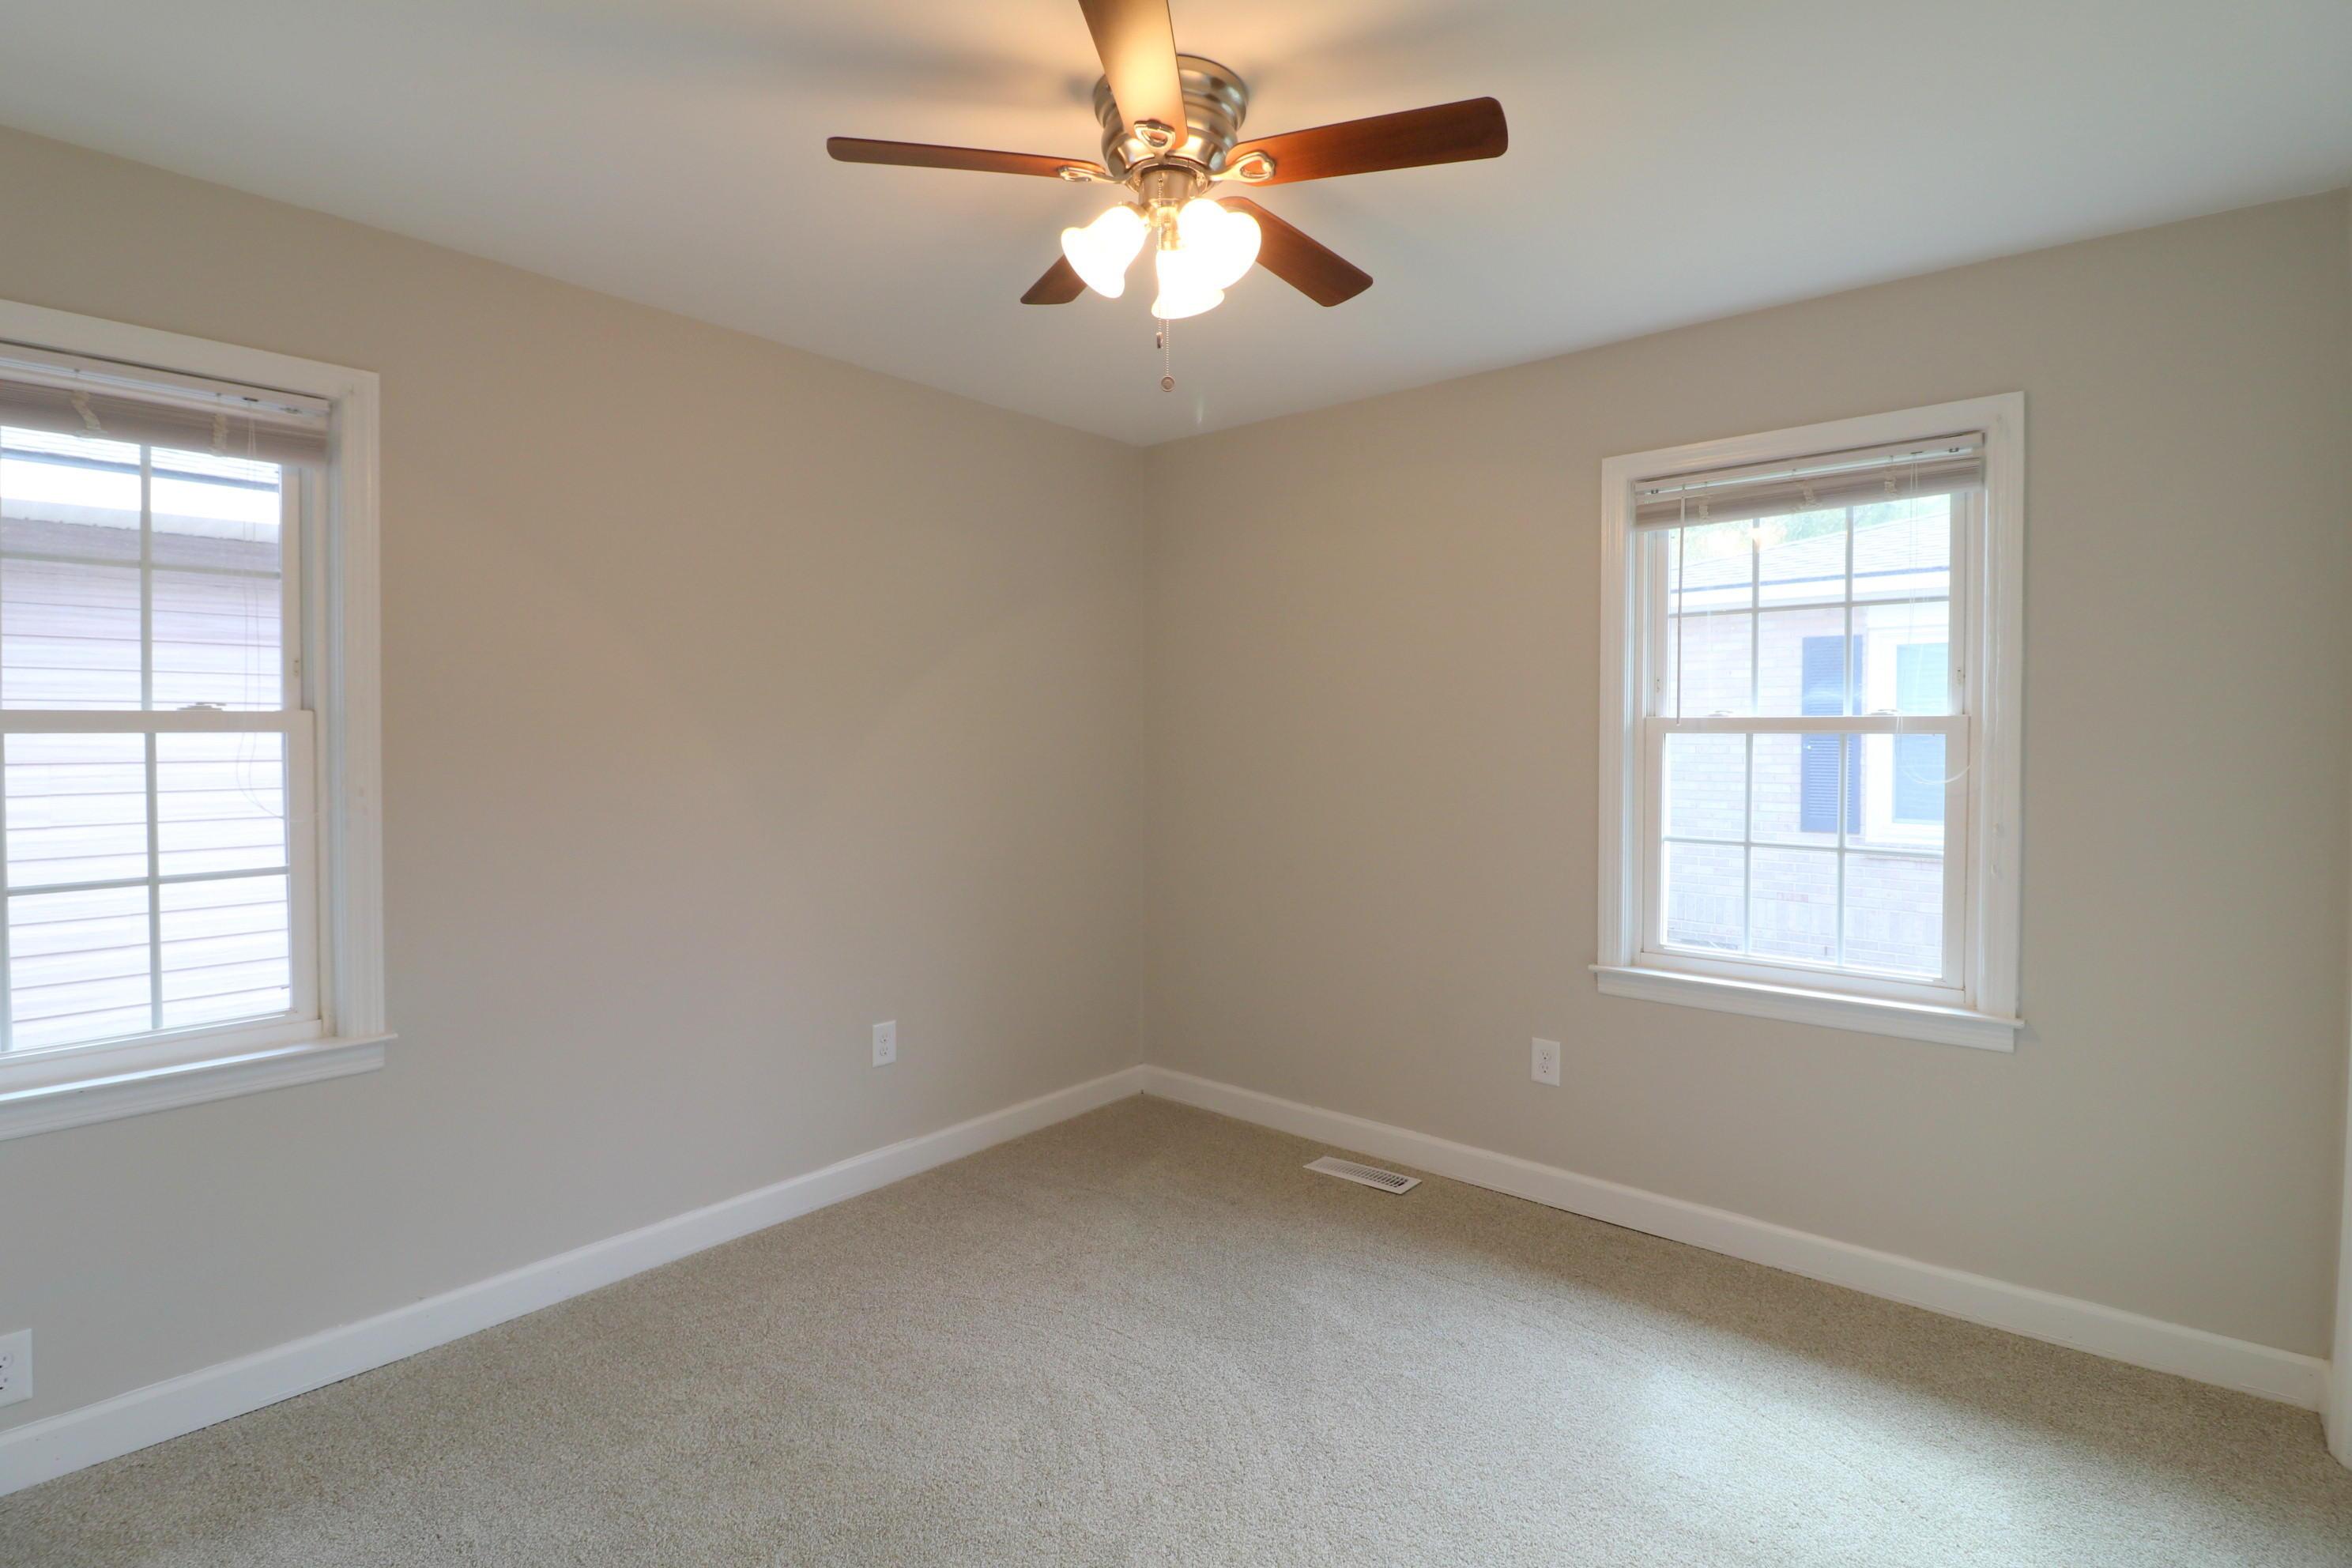 Park Circle Homes For Sale - 5274 Potomac, North Charleston, SC - 9